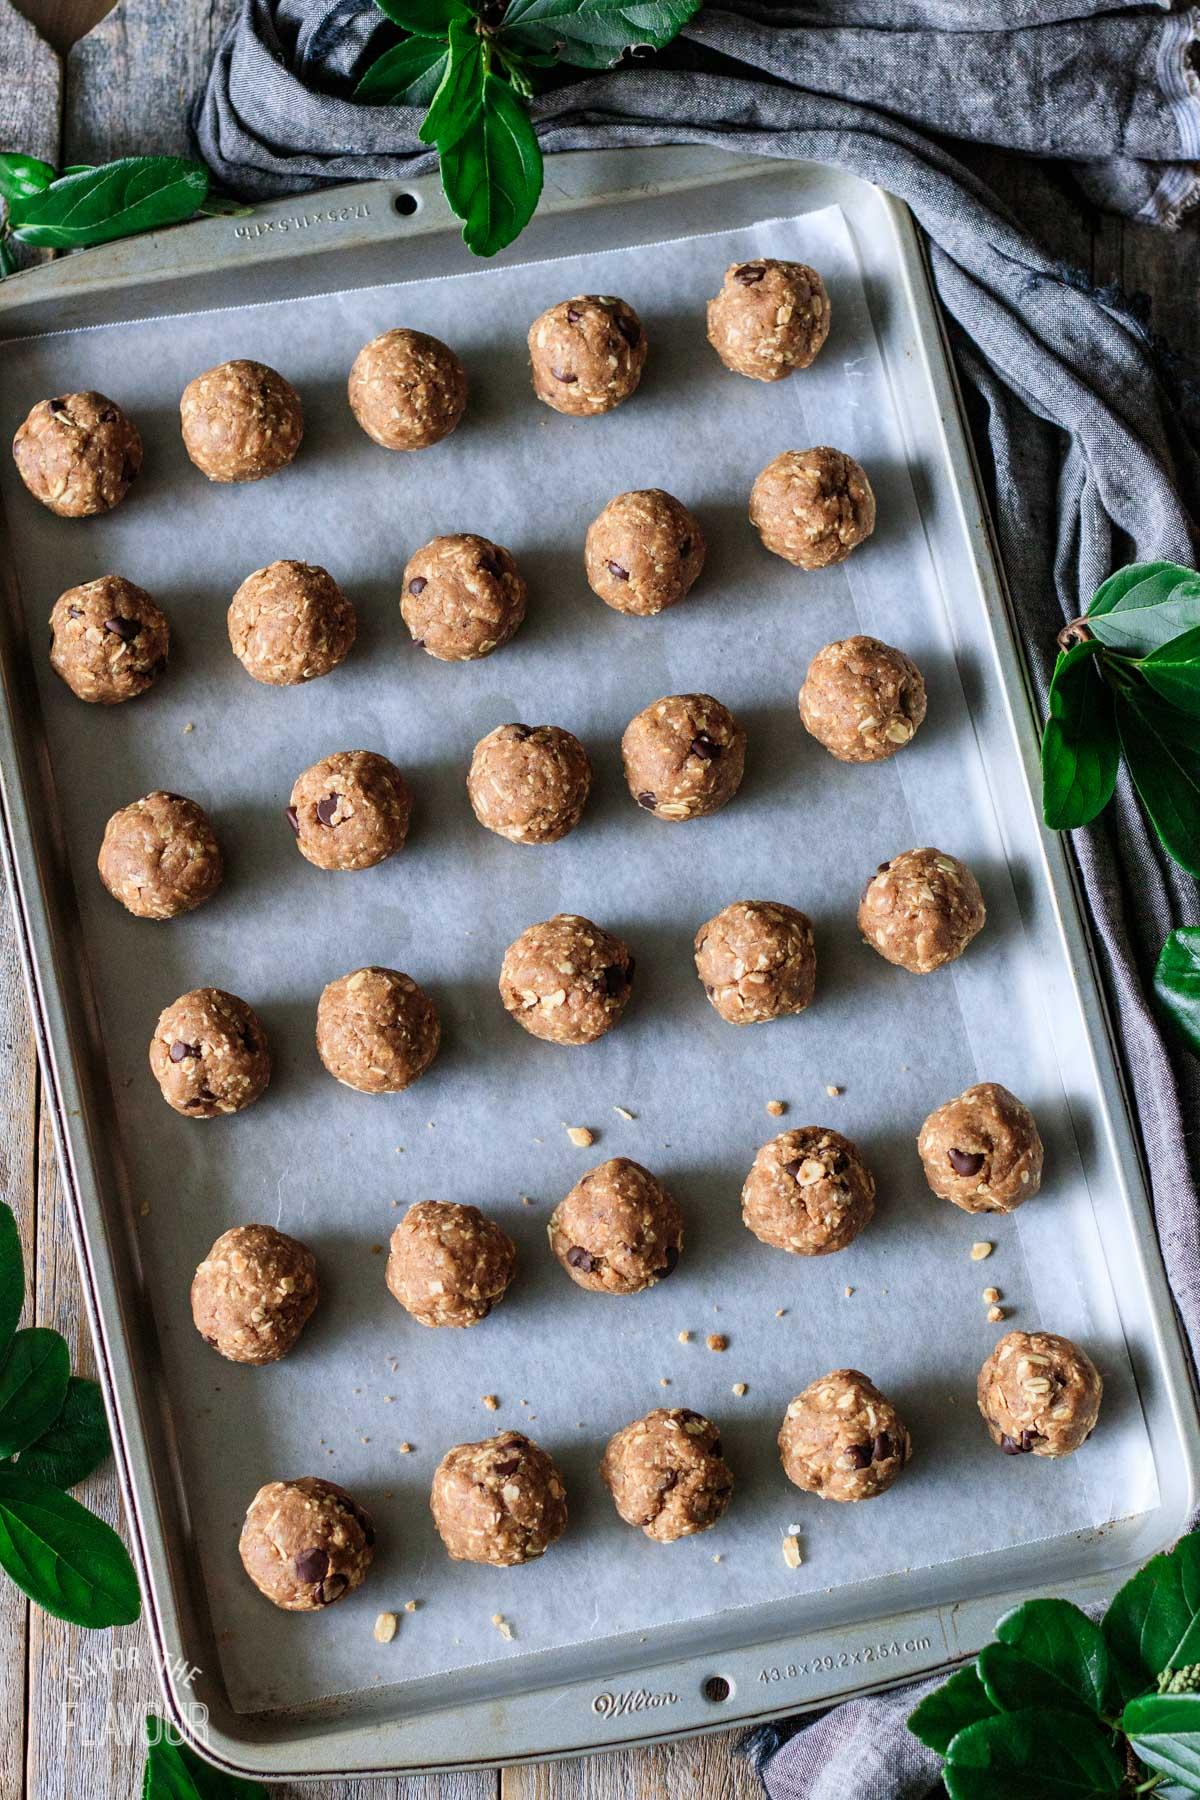 vegan protein balls on a cookie sheet